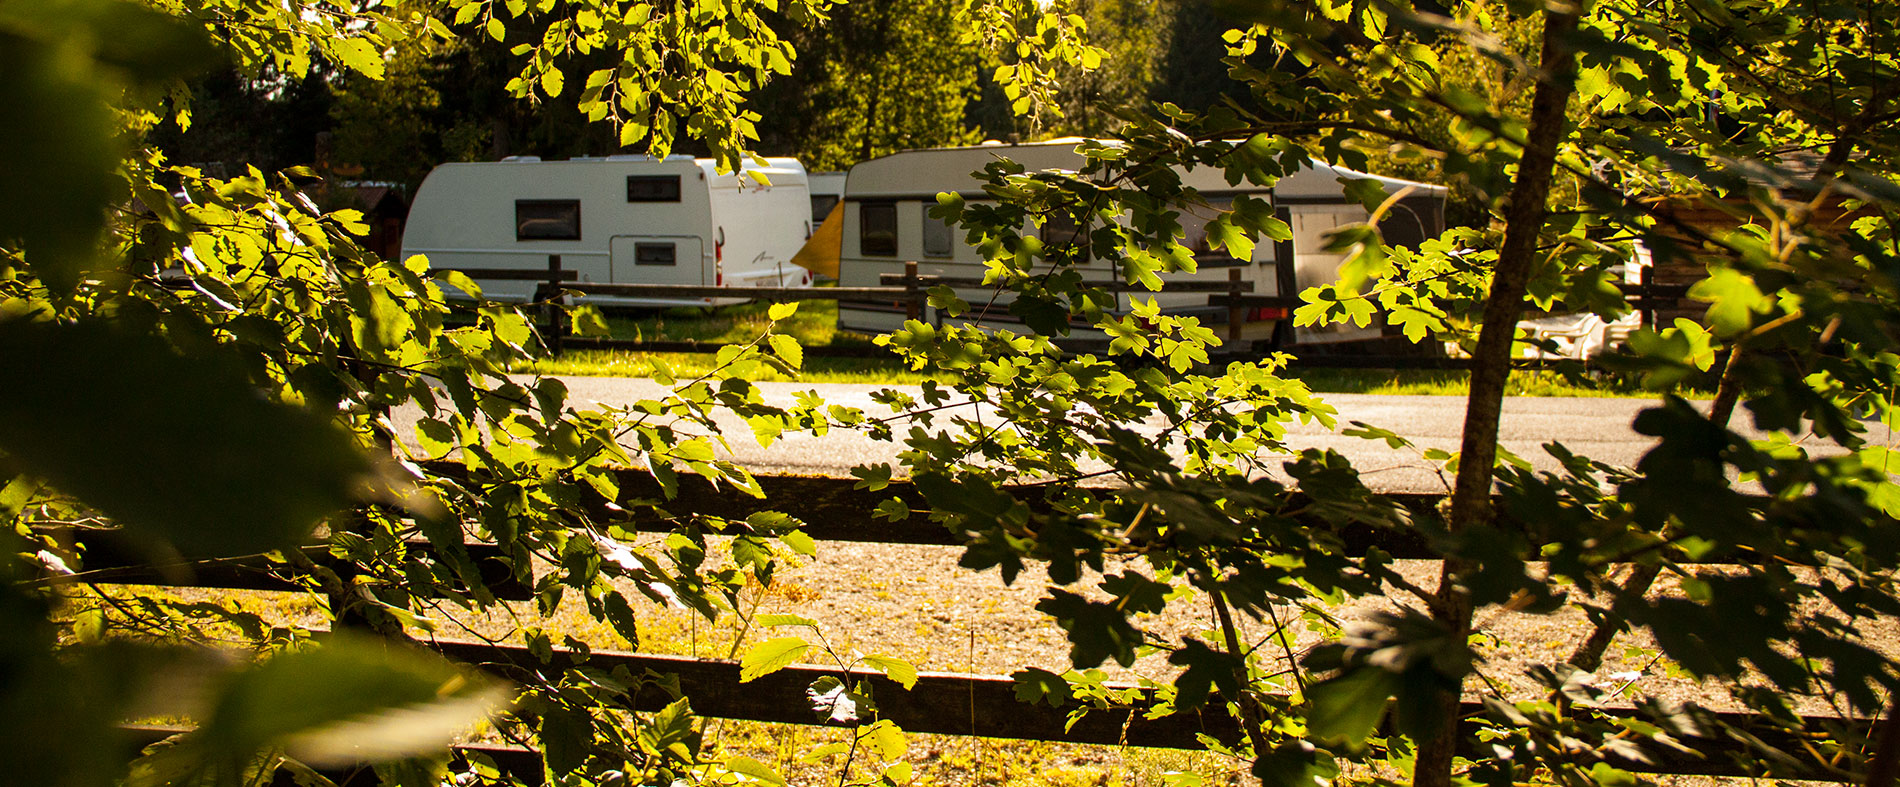 lightbox-camping-saignelegier-camping11